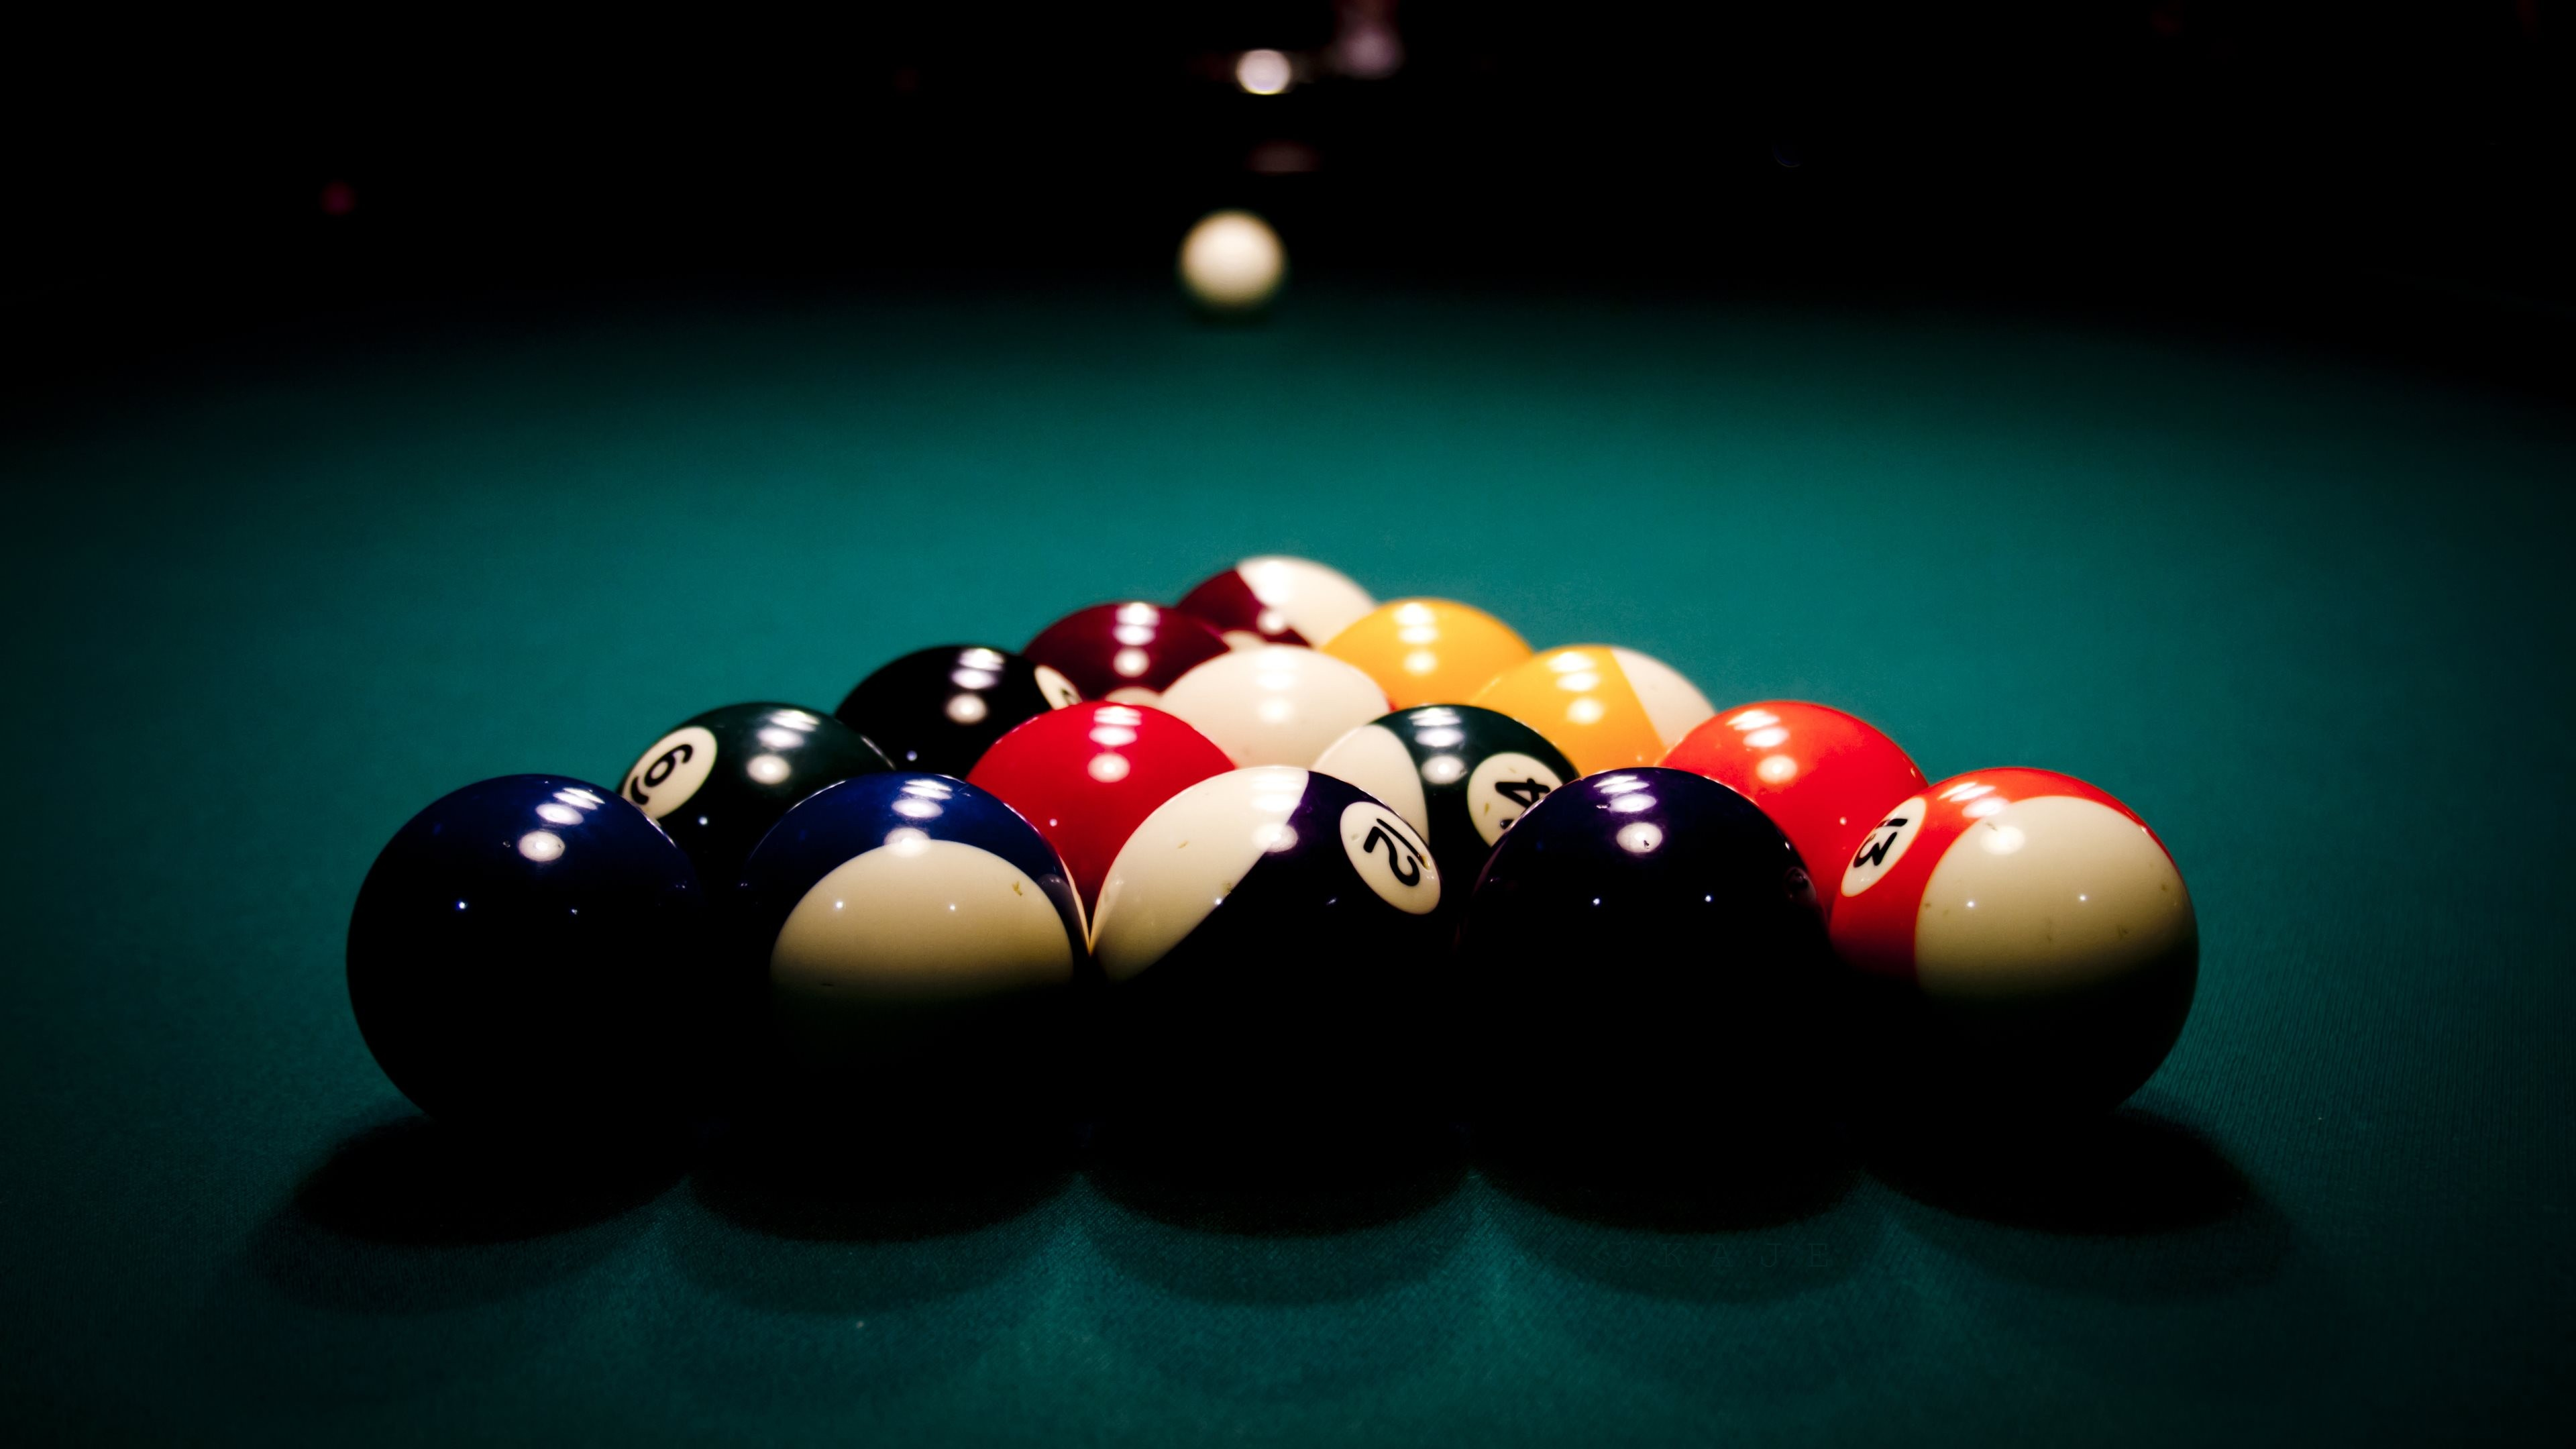 Billard Balls, HD Sports, 4k Wallpapers, Images